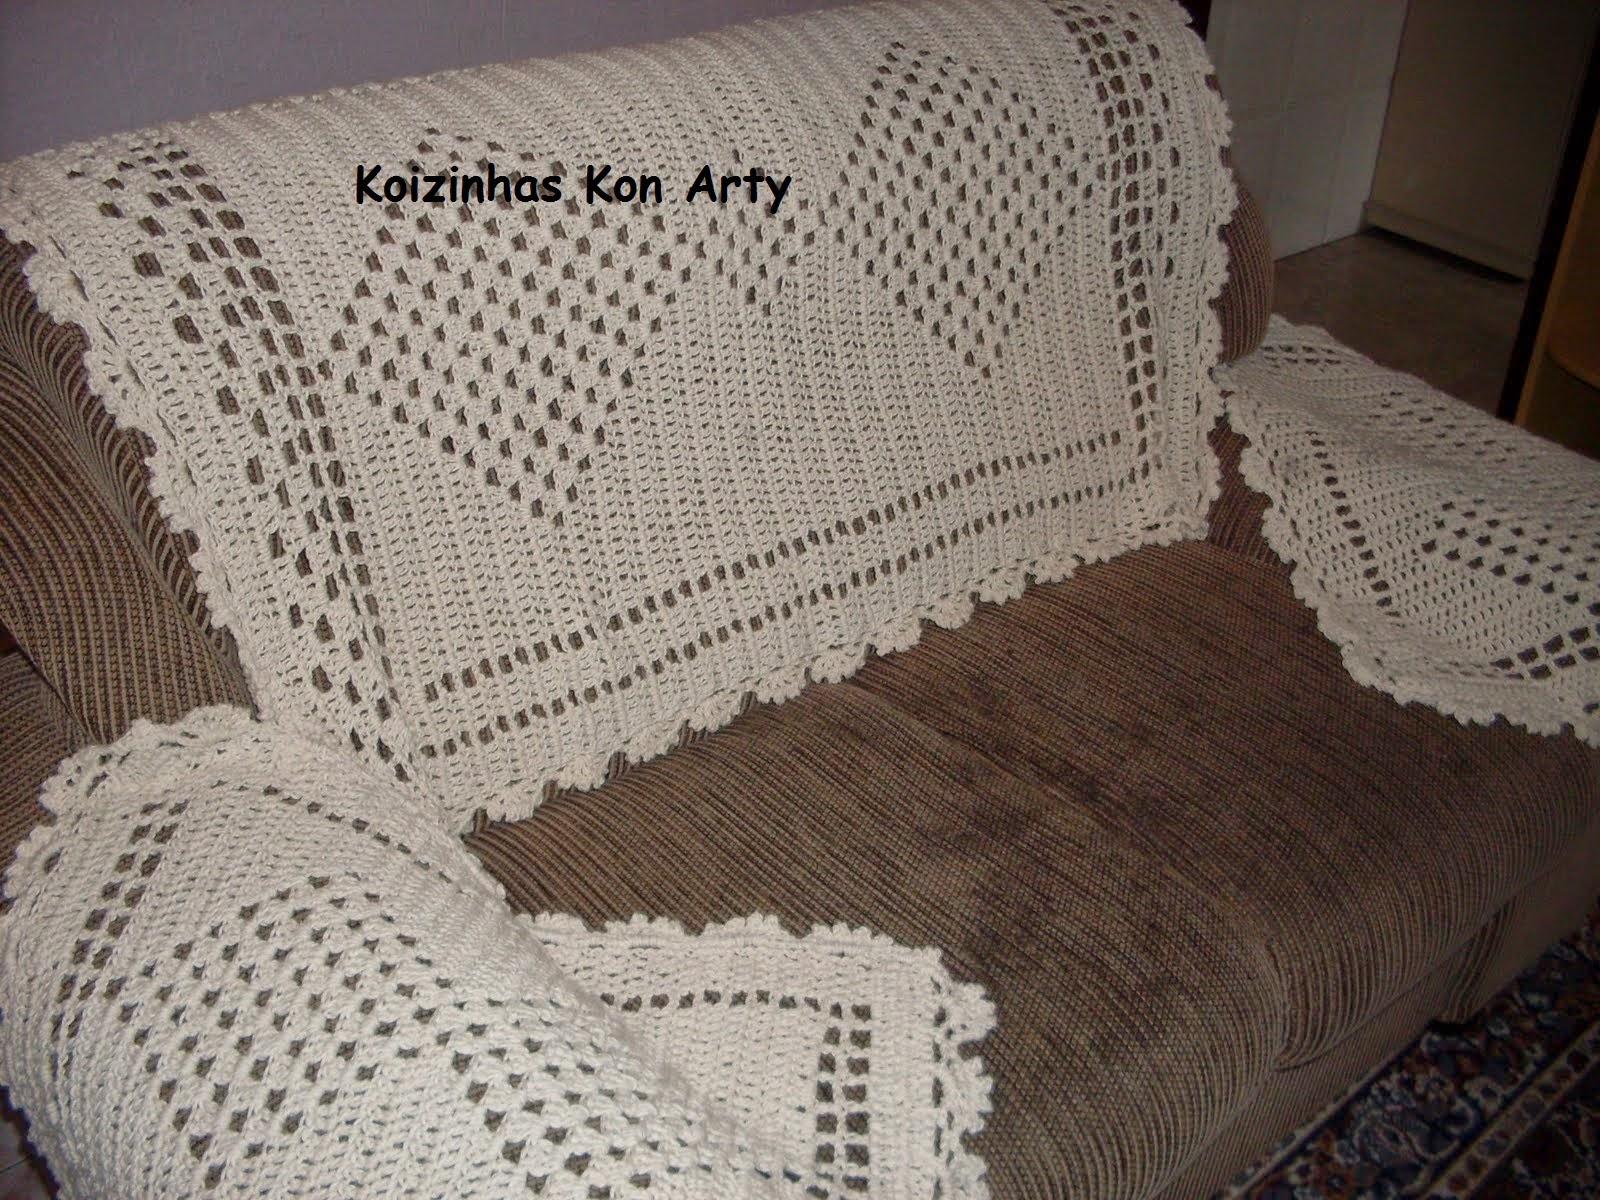 Koizinhas kon arty croch artesanato jogo de manta - Manta de sofa ...